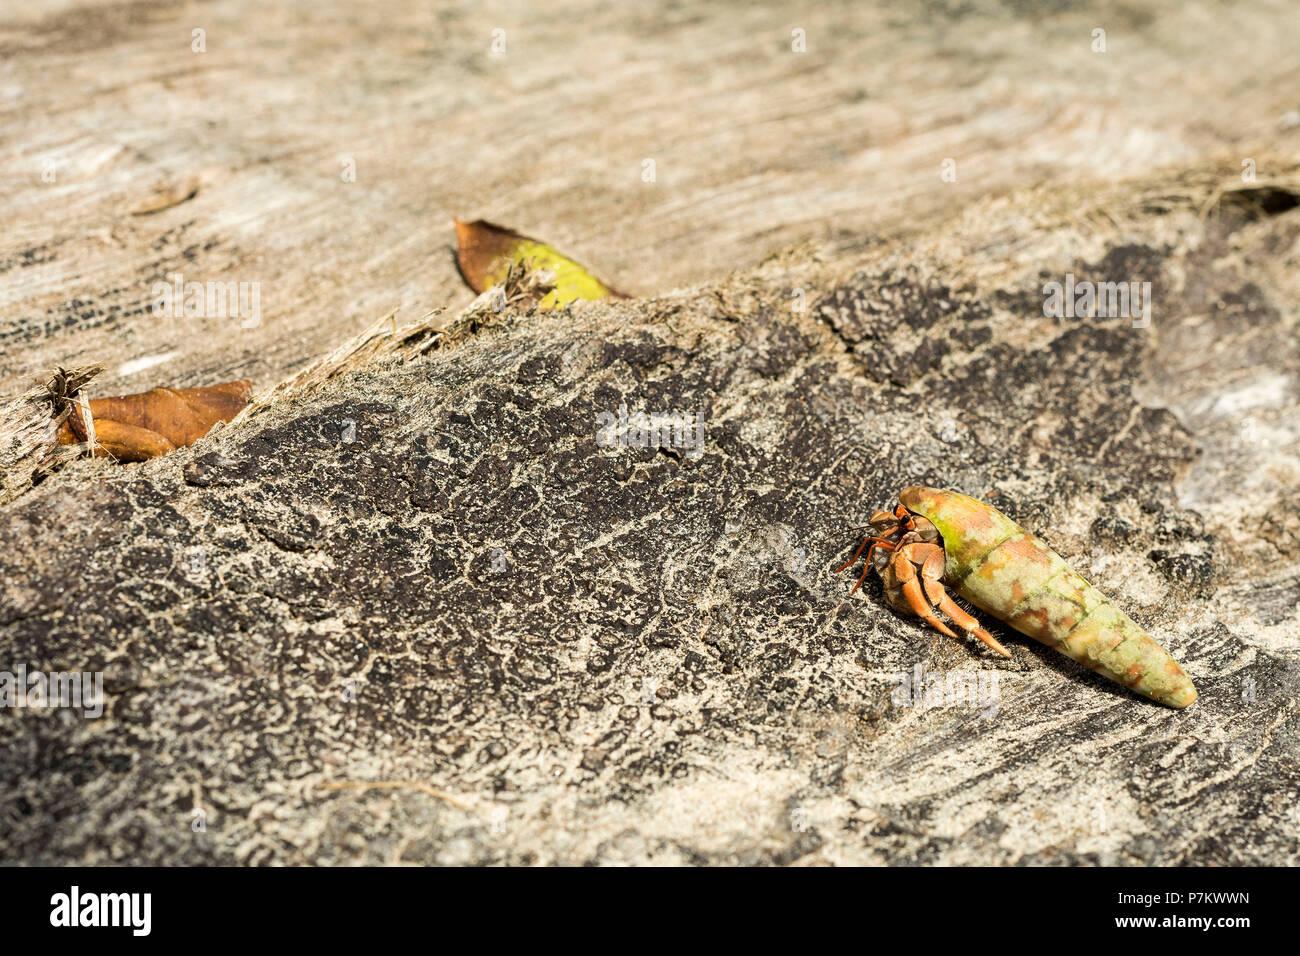 Hermit crab on the beach - Stock Image